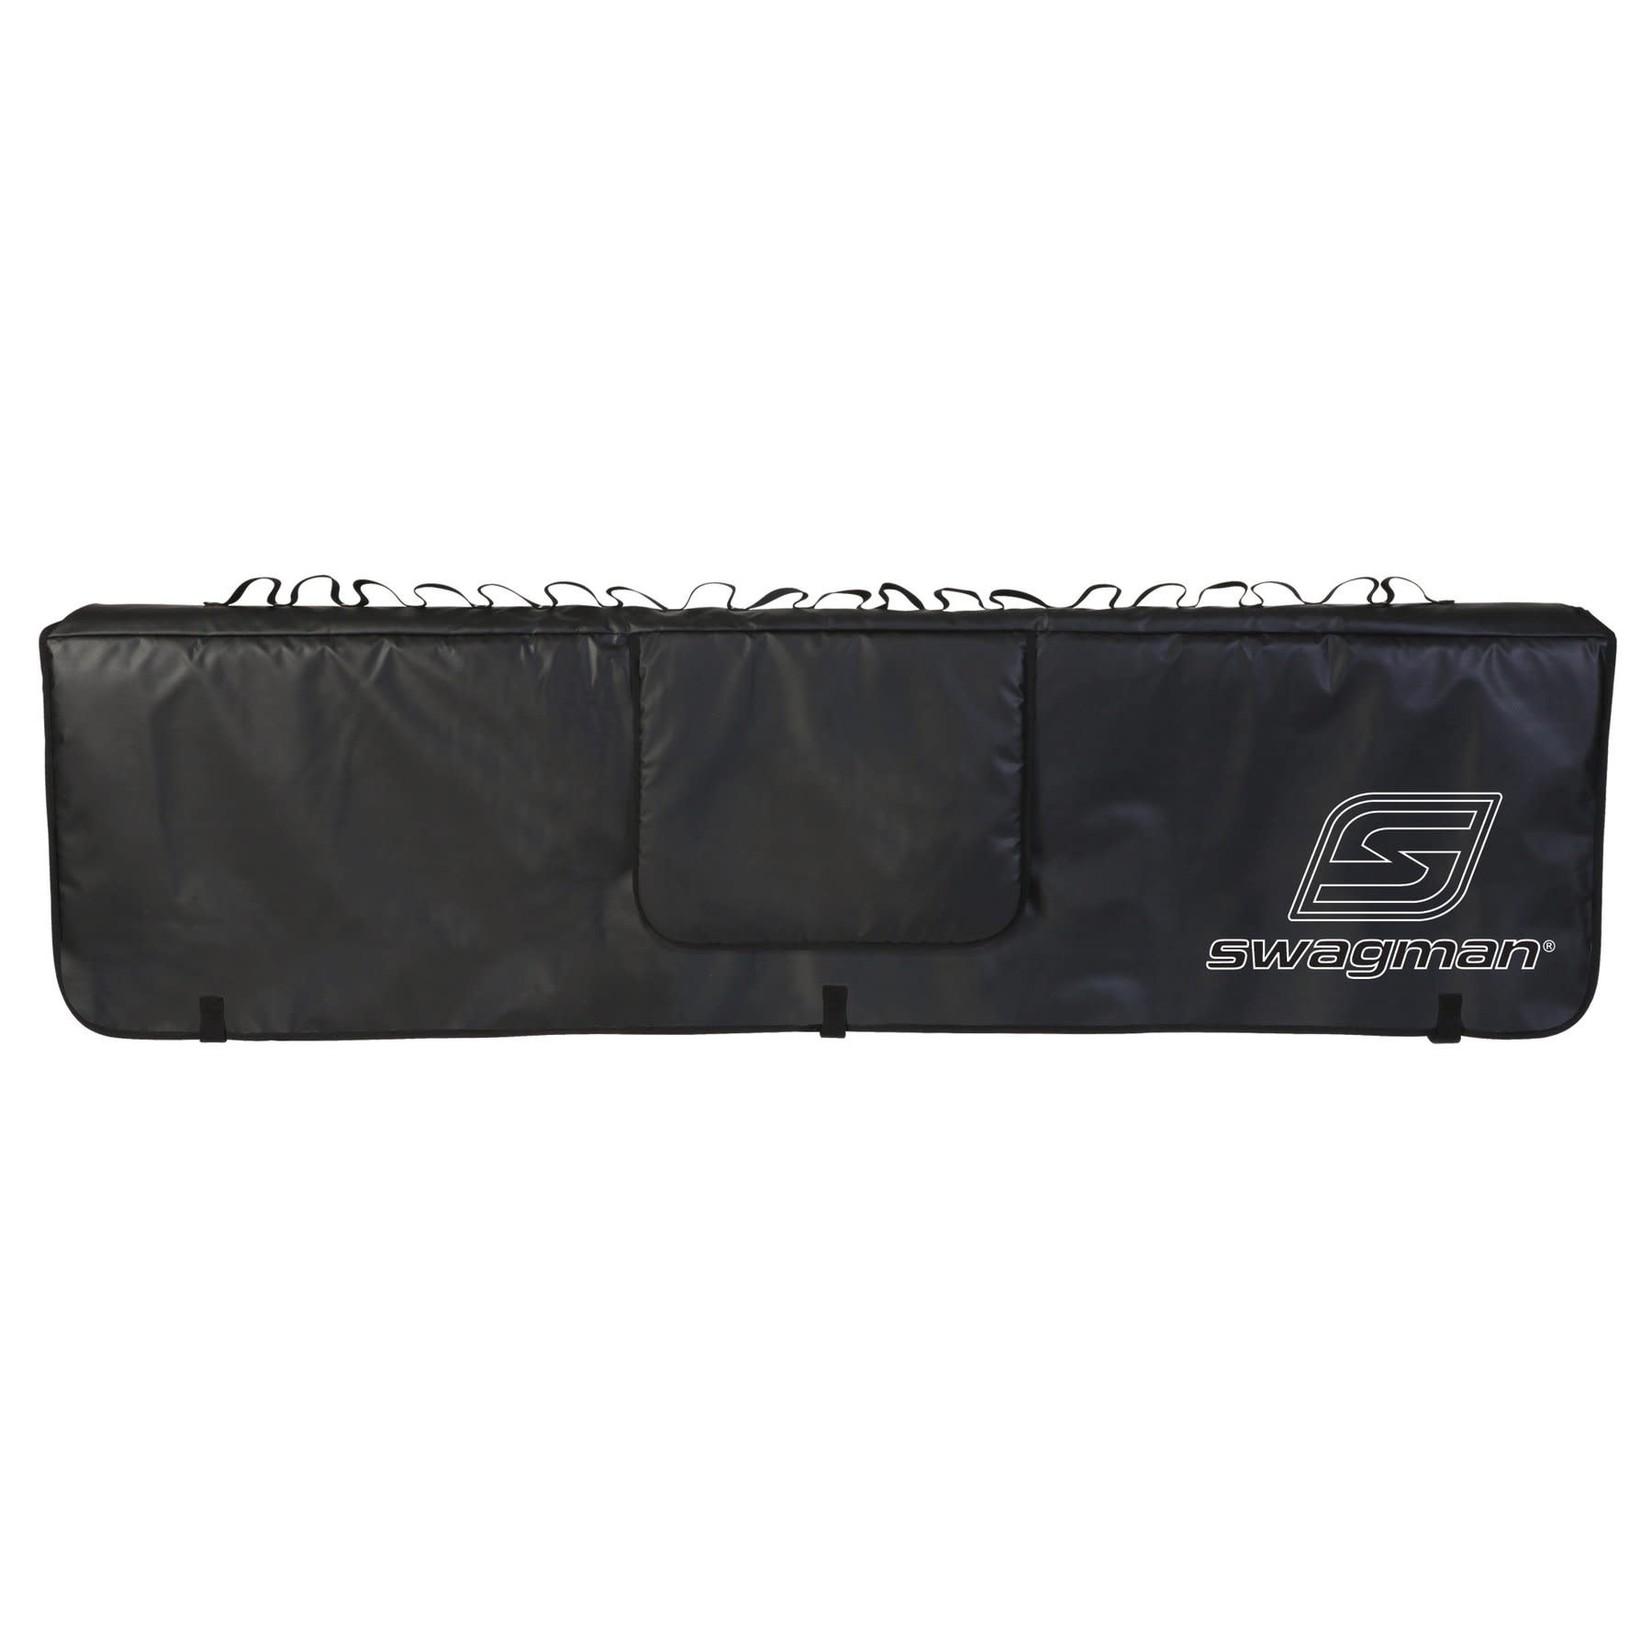 Swagman Swagman Tailgate Pad, Tailwhip Full Size